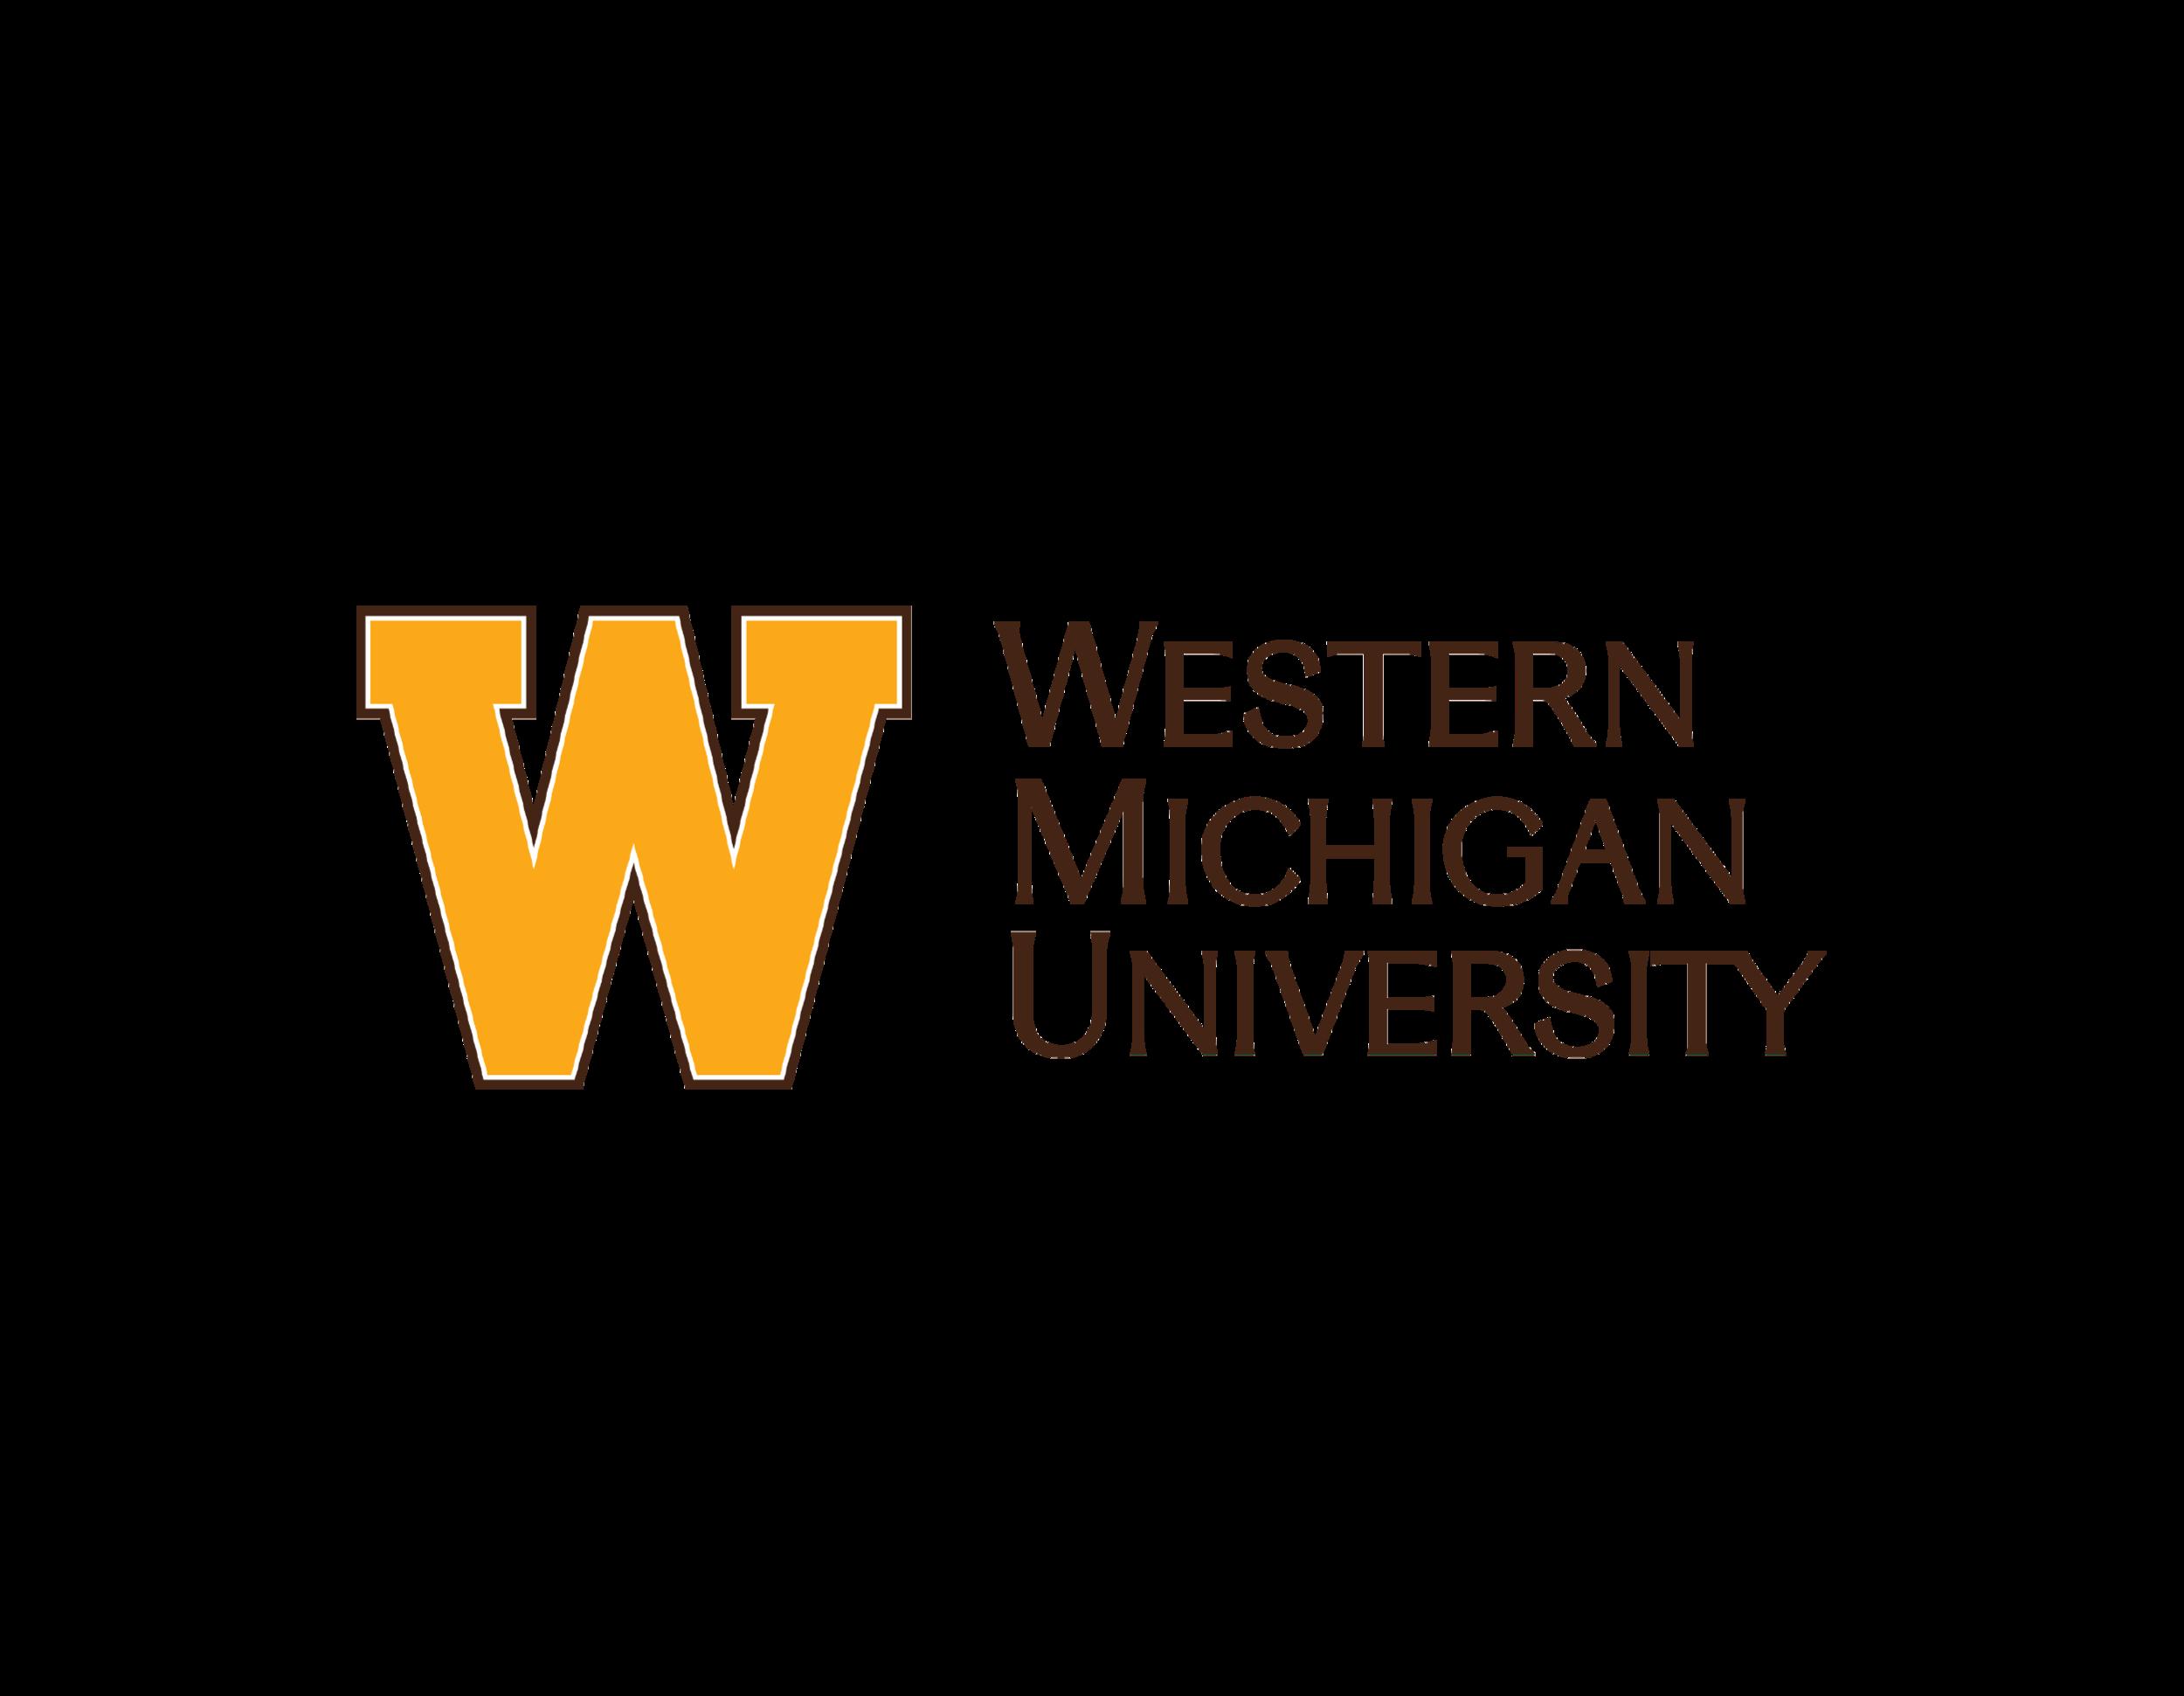 Western Michigan University@300x-8.png